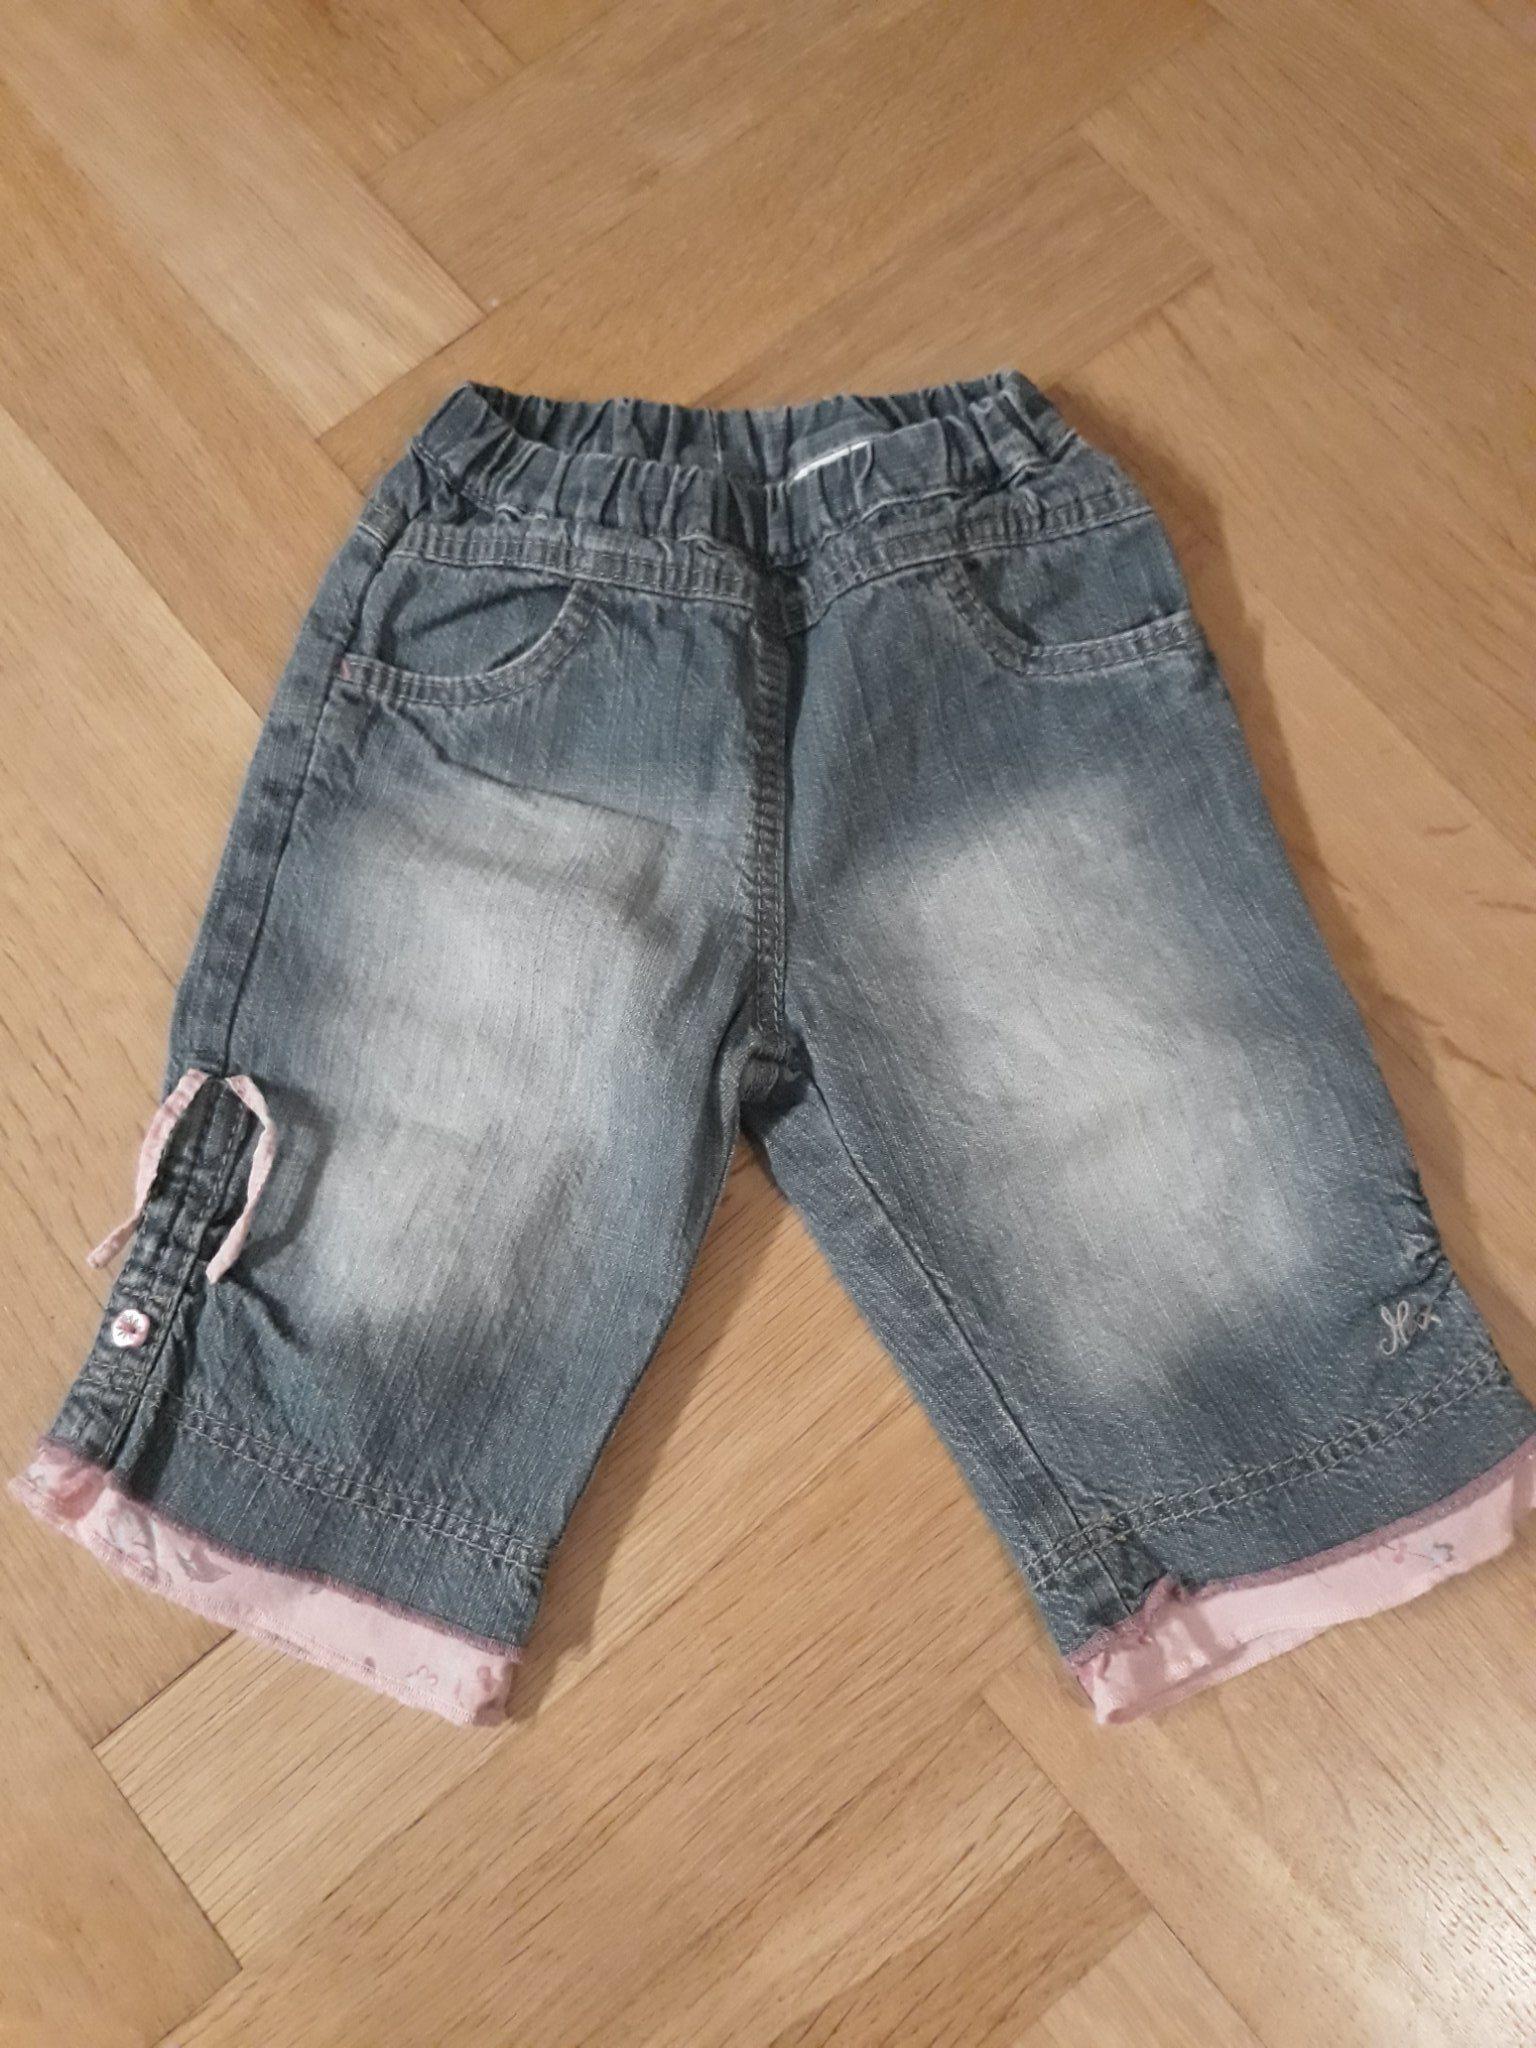 Jeans storlek 62 2-4 månader Nyfödd Bebis Byxo.. (339418053) ᐈ Köp ... 0a4ae1b2dc156